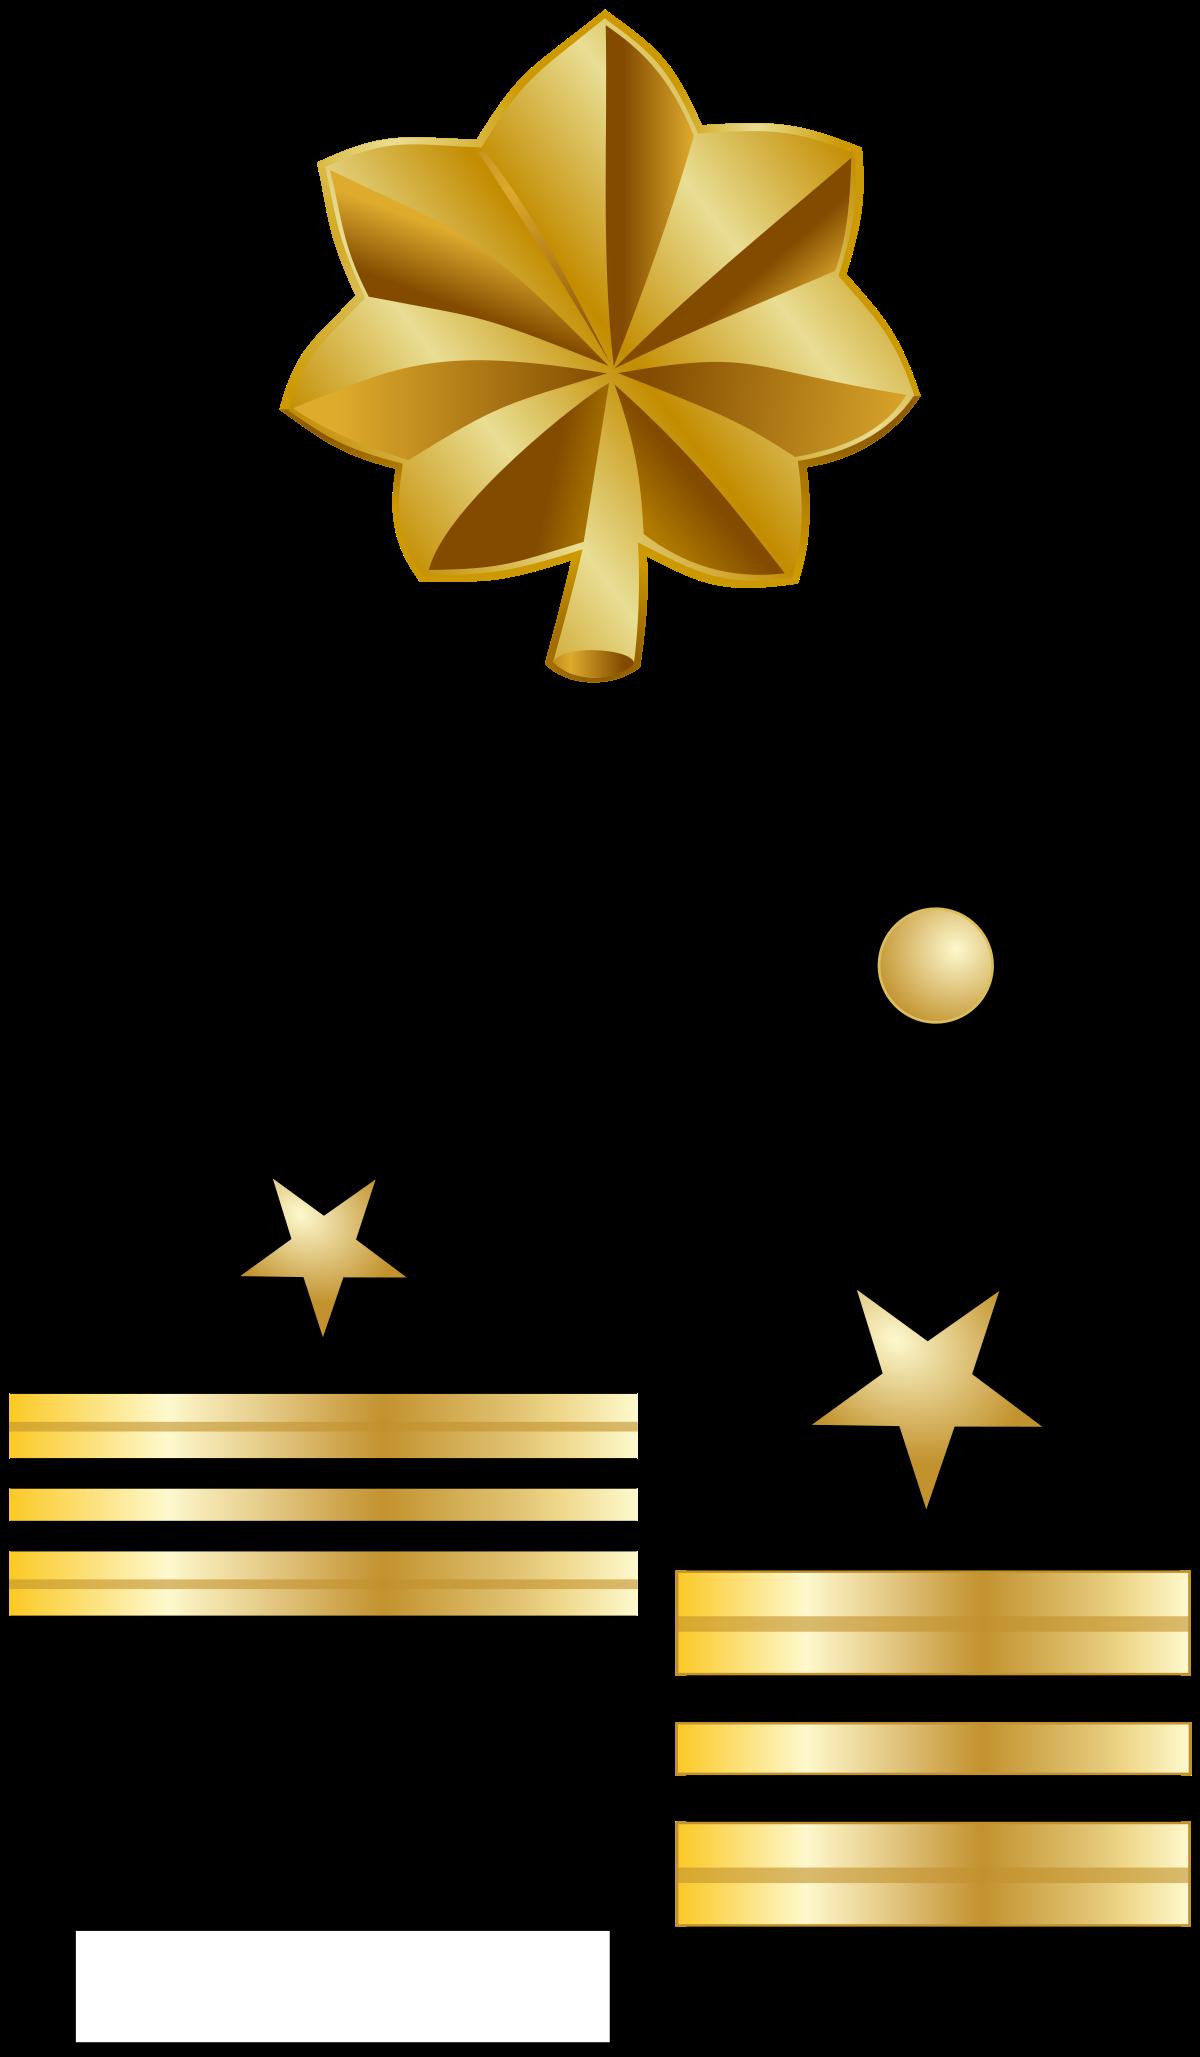 Navy clipart seaman uniform. Lieutenant commander wikipedia